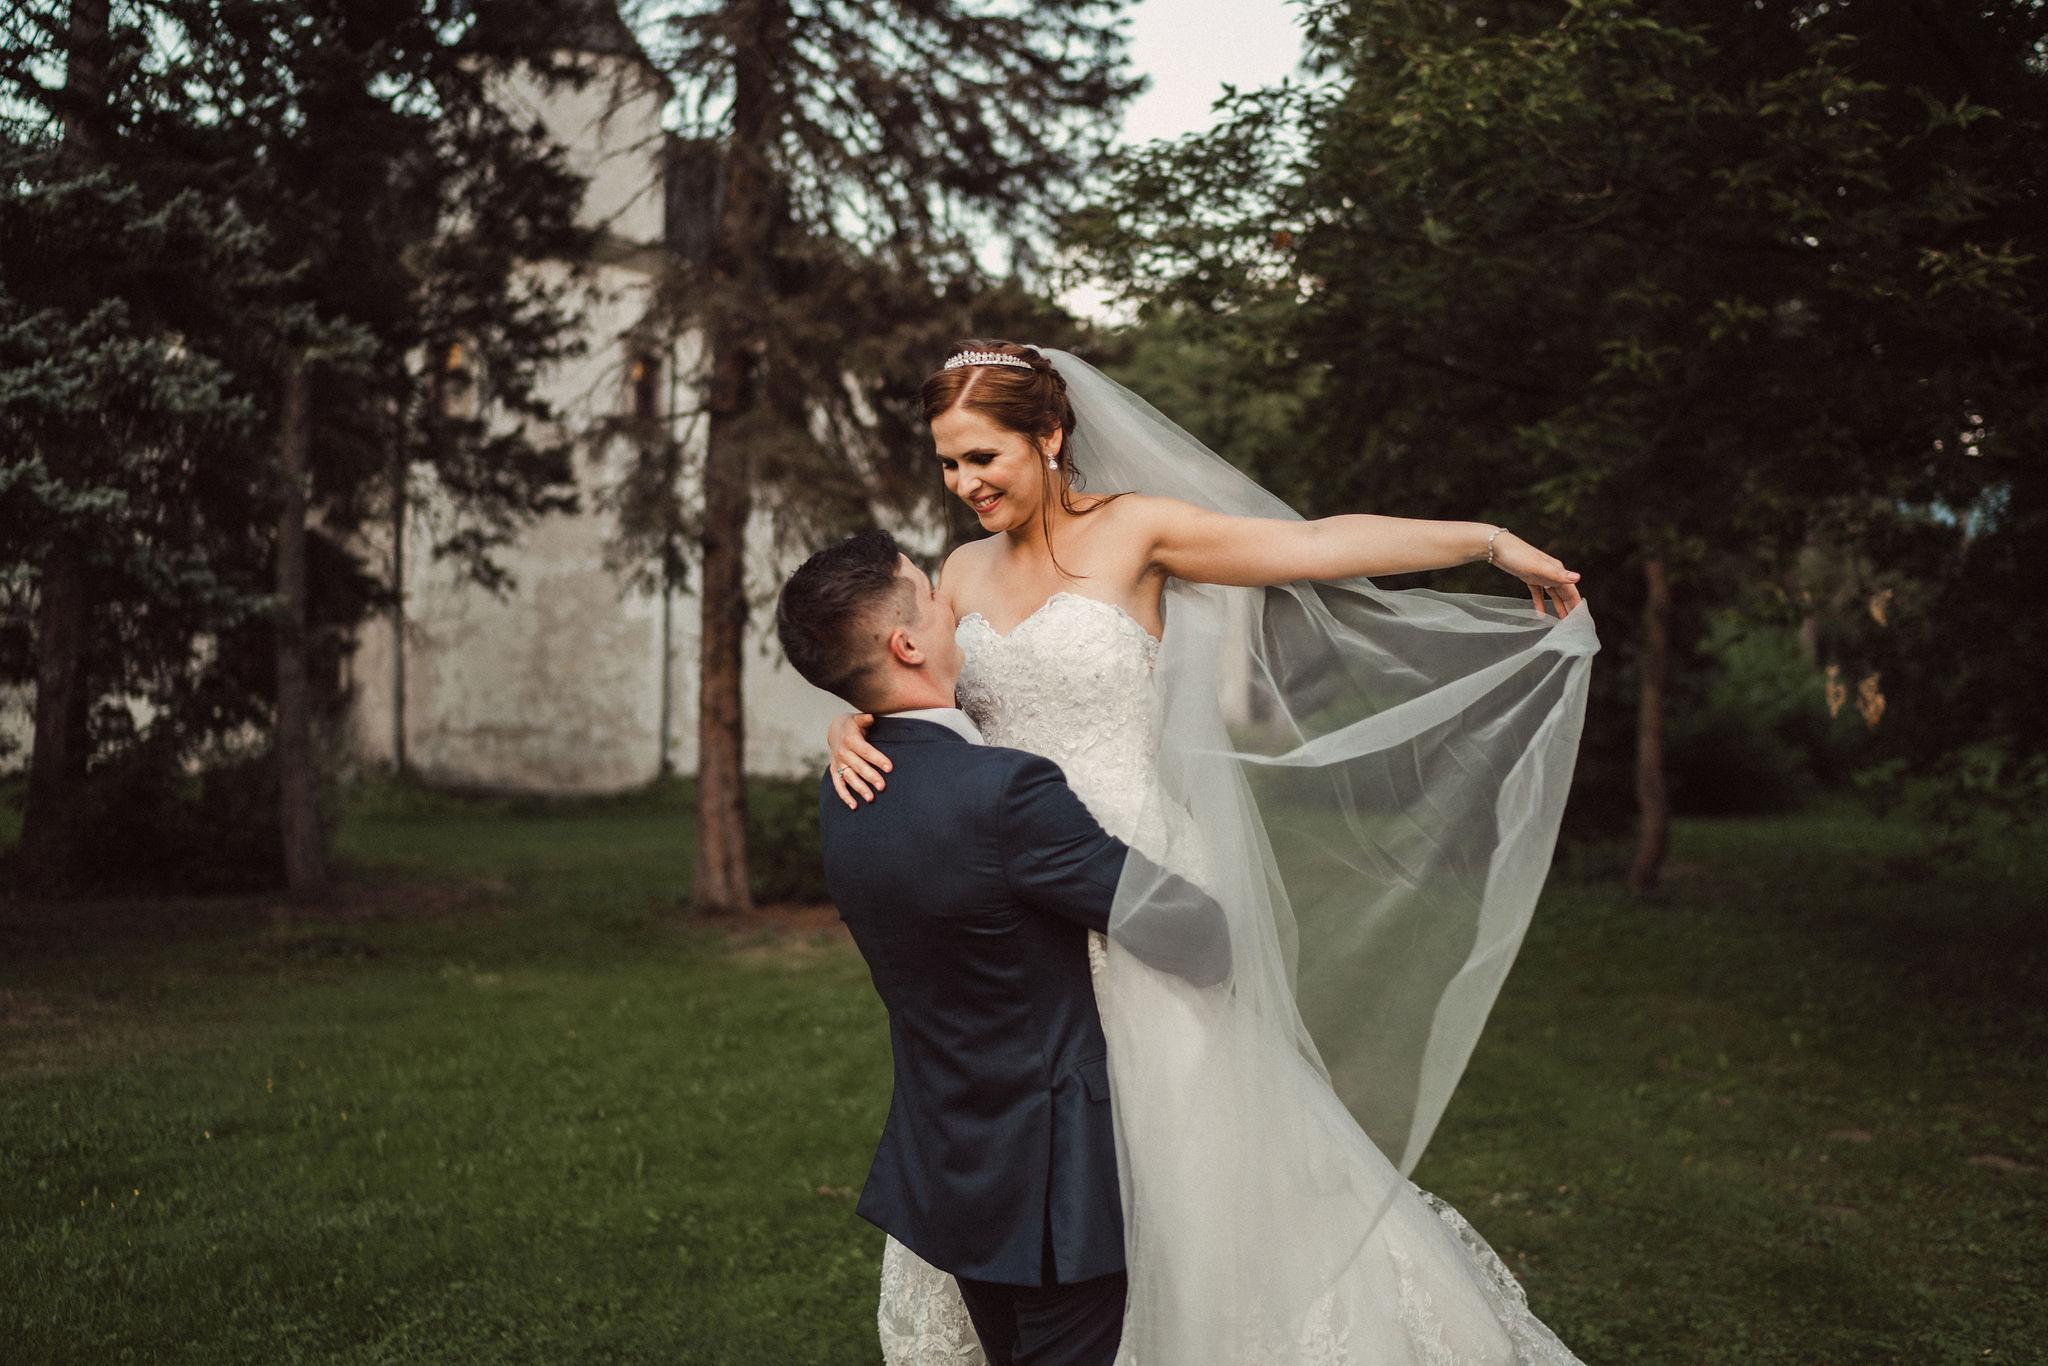 svadba-krasnany-kastieljpg